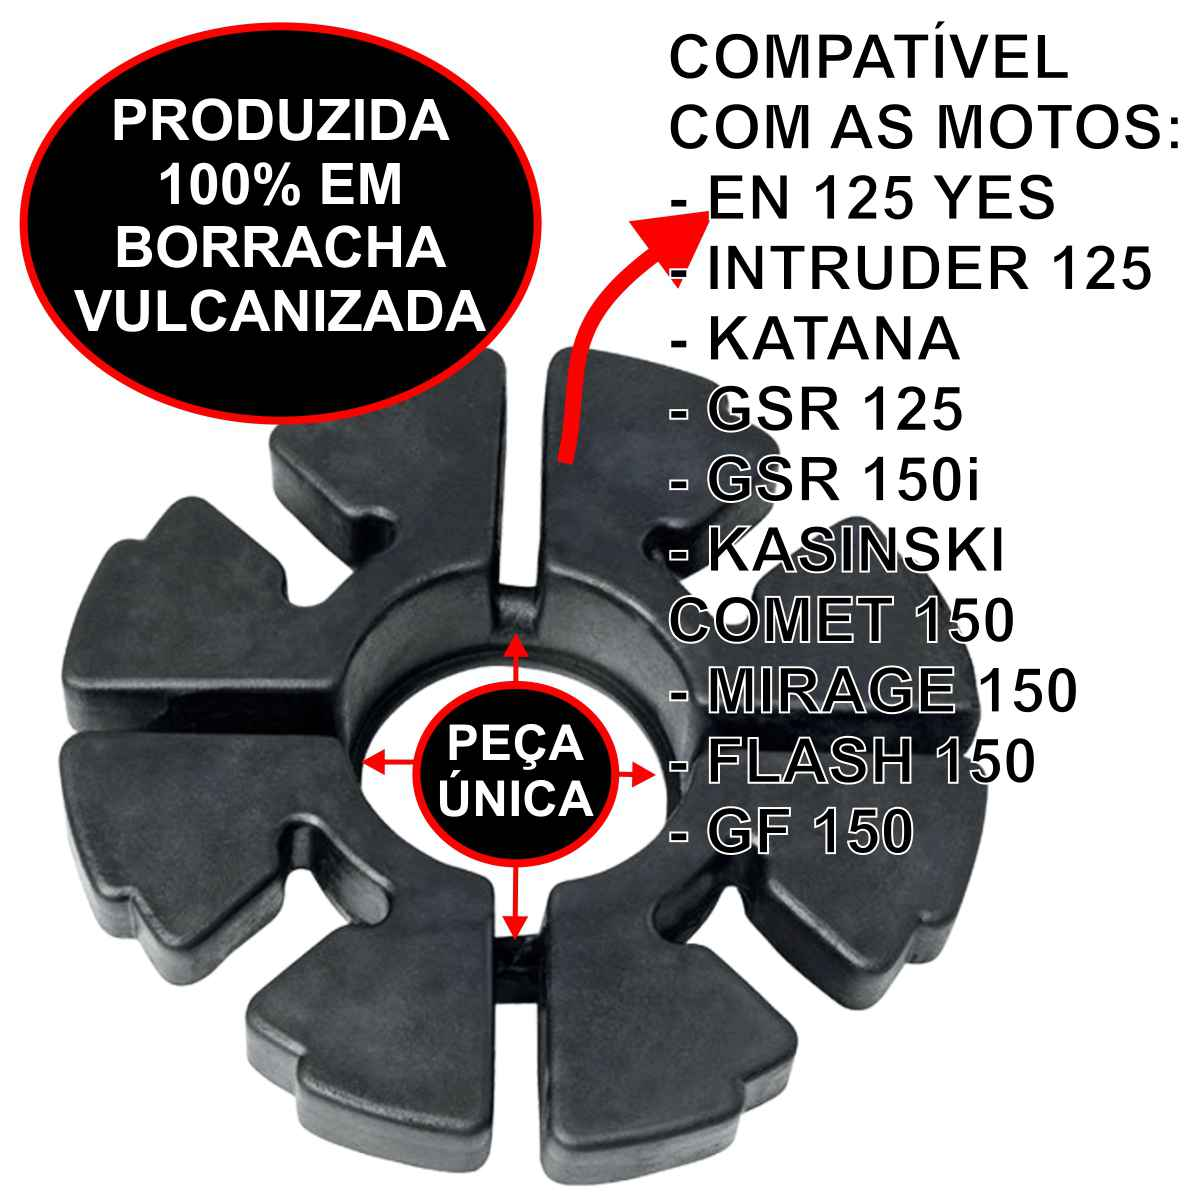 COXIM BRANDY CUBO TRASEIRO BORRACHA RODA MOTO EN 125 YES / INTRUDER / KATANA / COMET 150 PEÇA ÚNICA